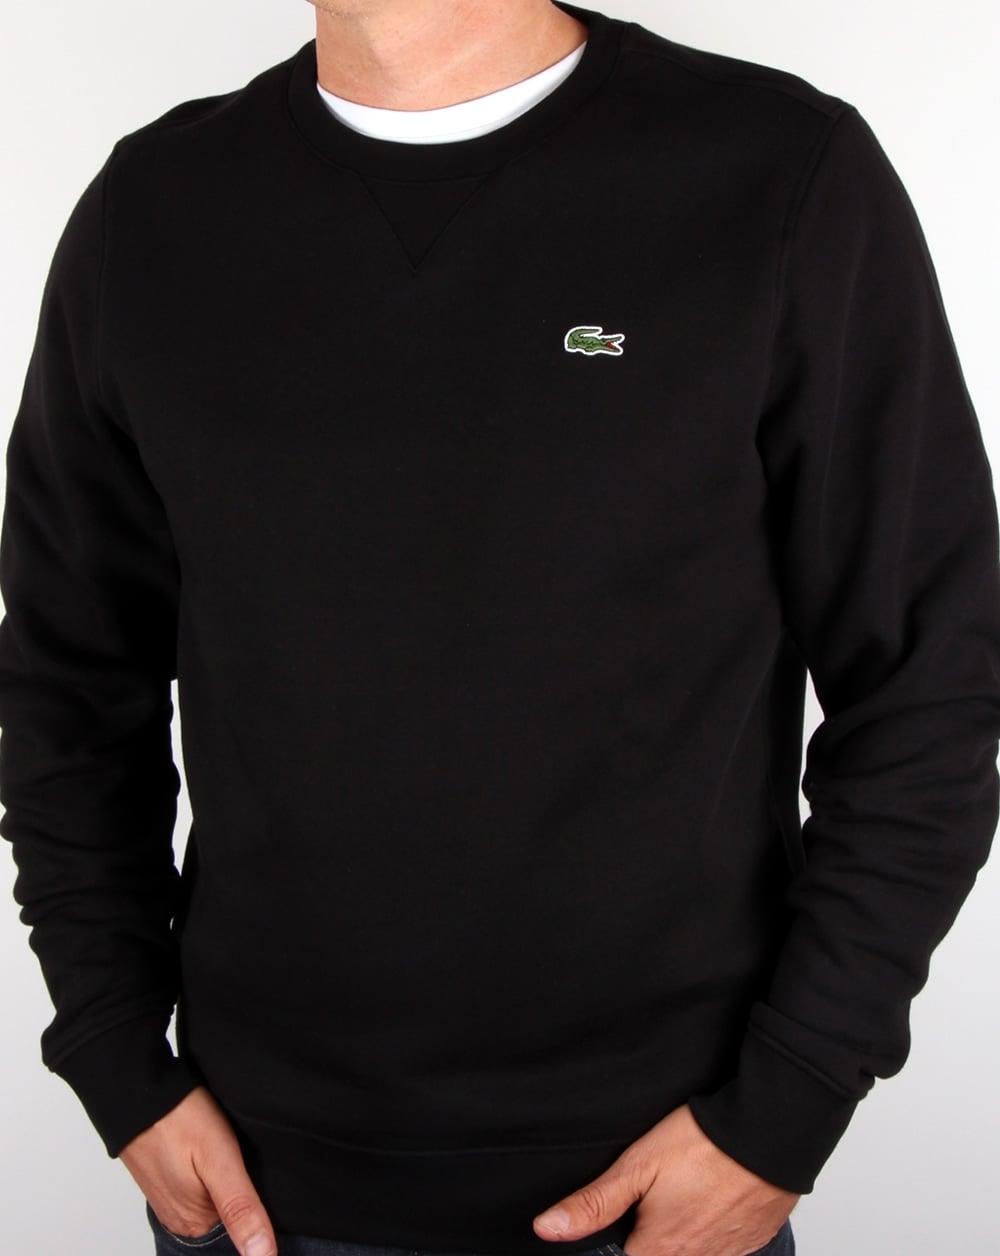 2a1b88607b Lacoste Crew Neck Sweatshirt Black